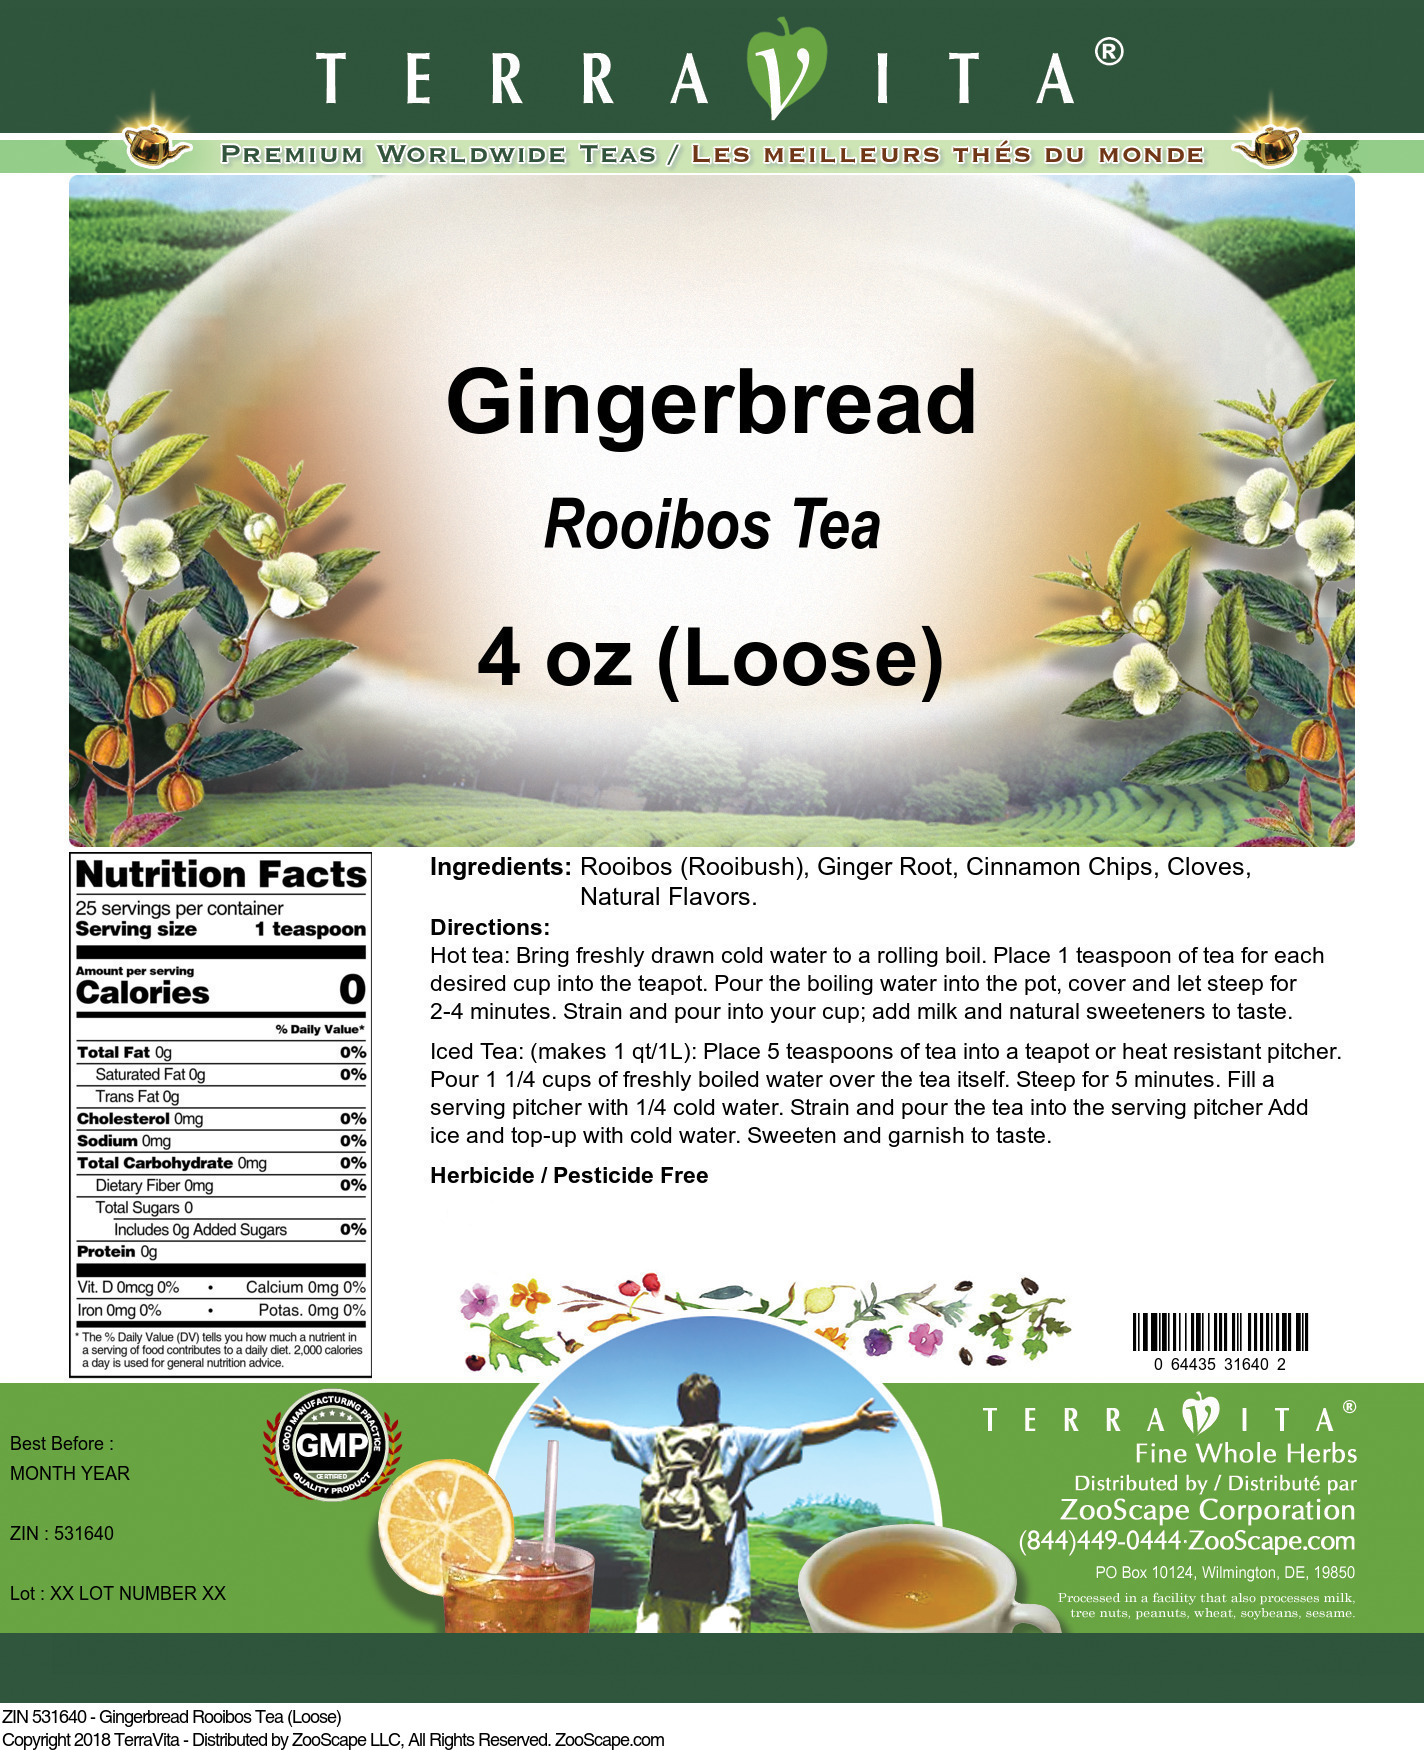 Gingerbread Rooibos Tea (Loose)